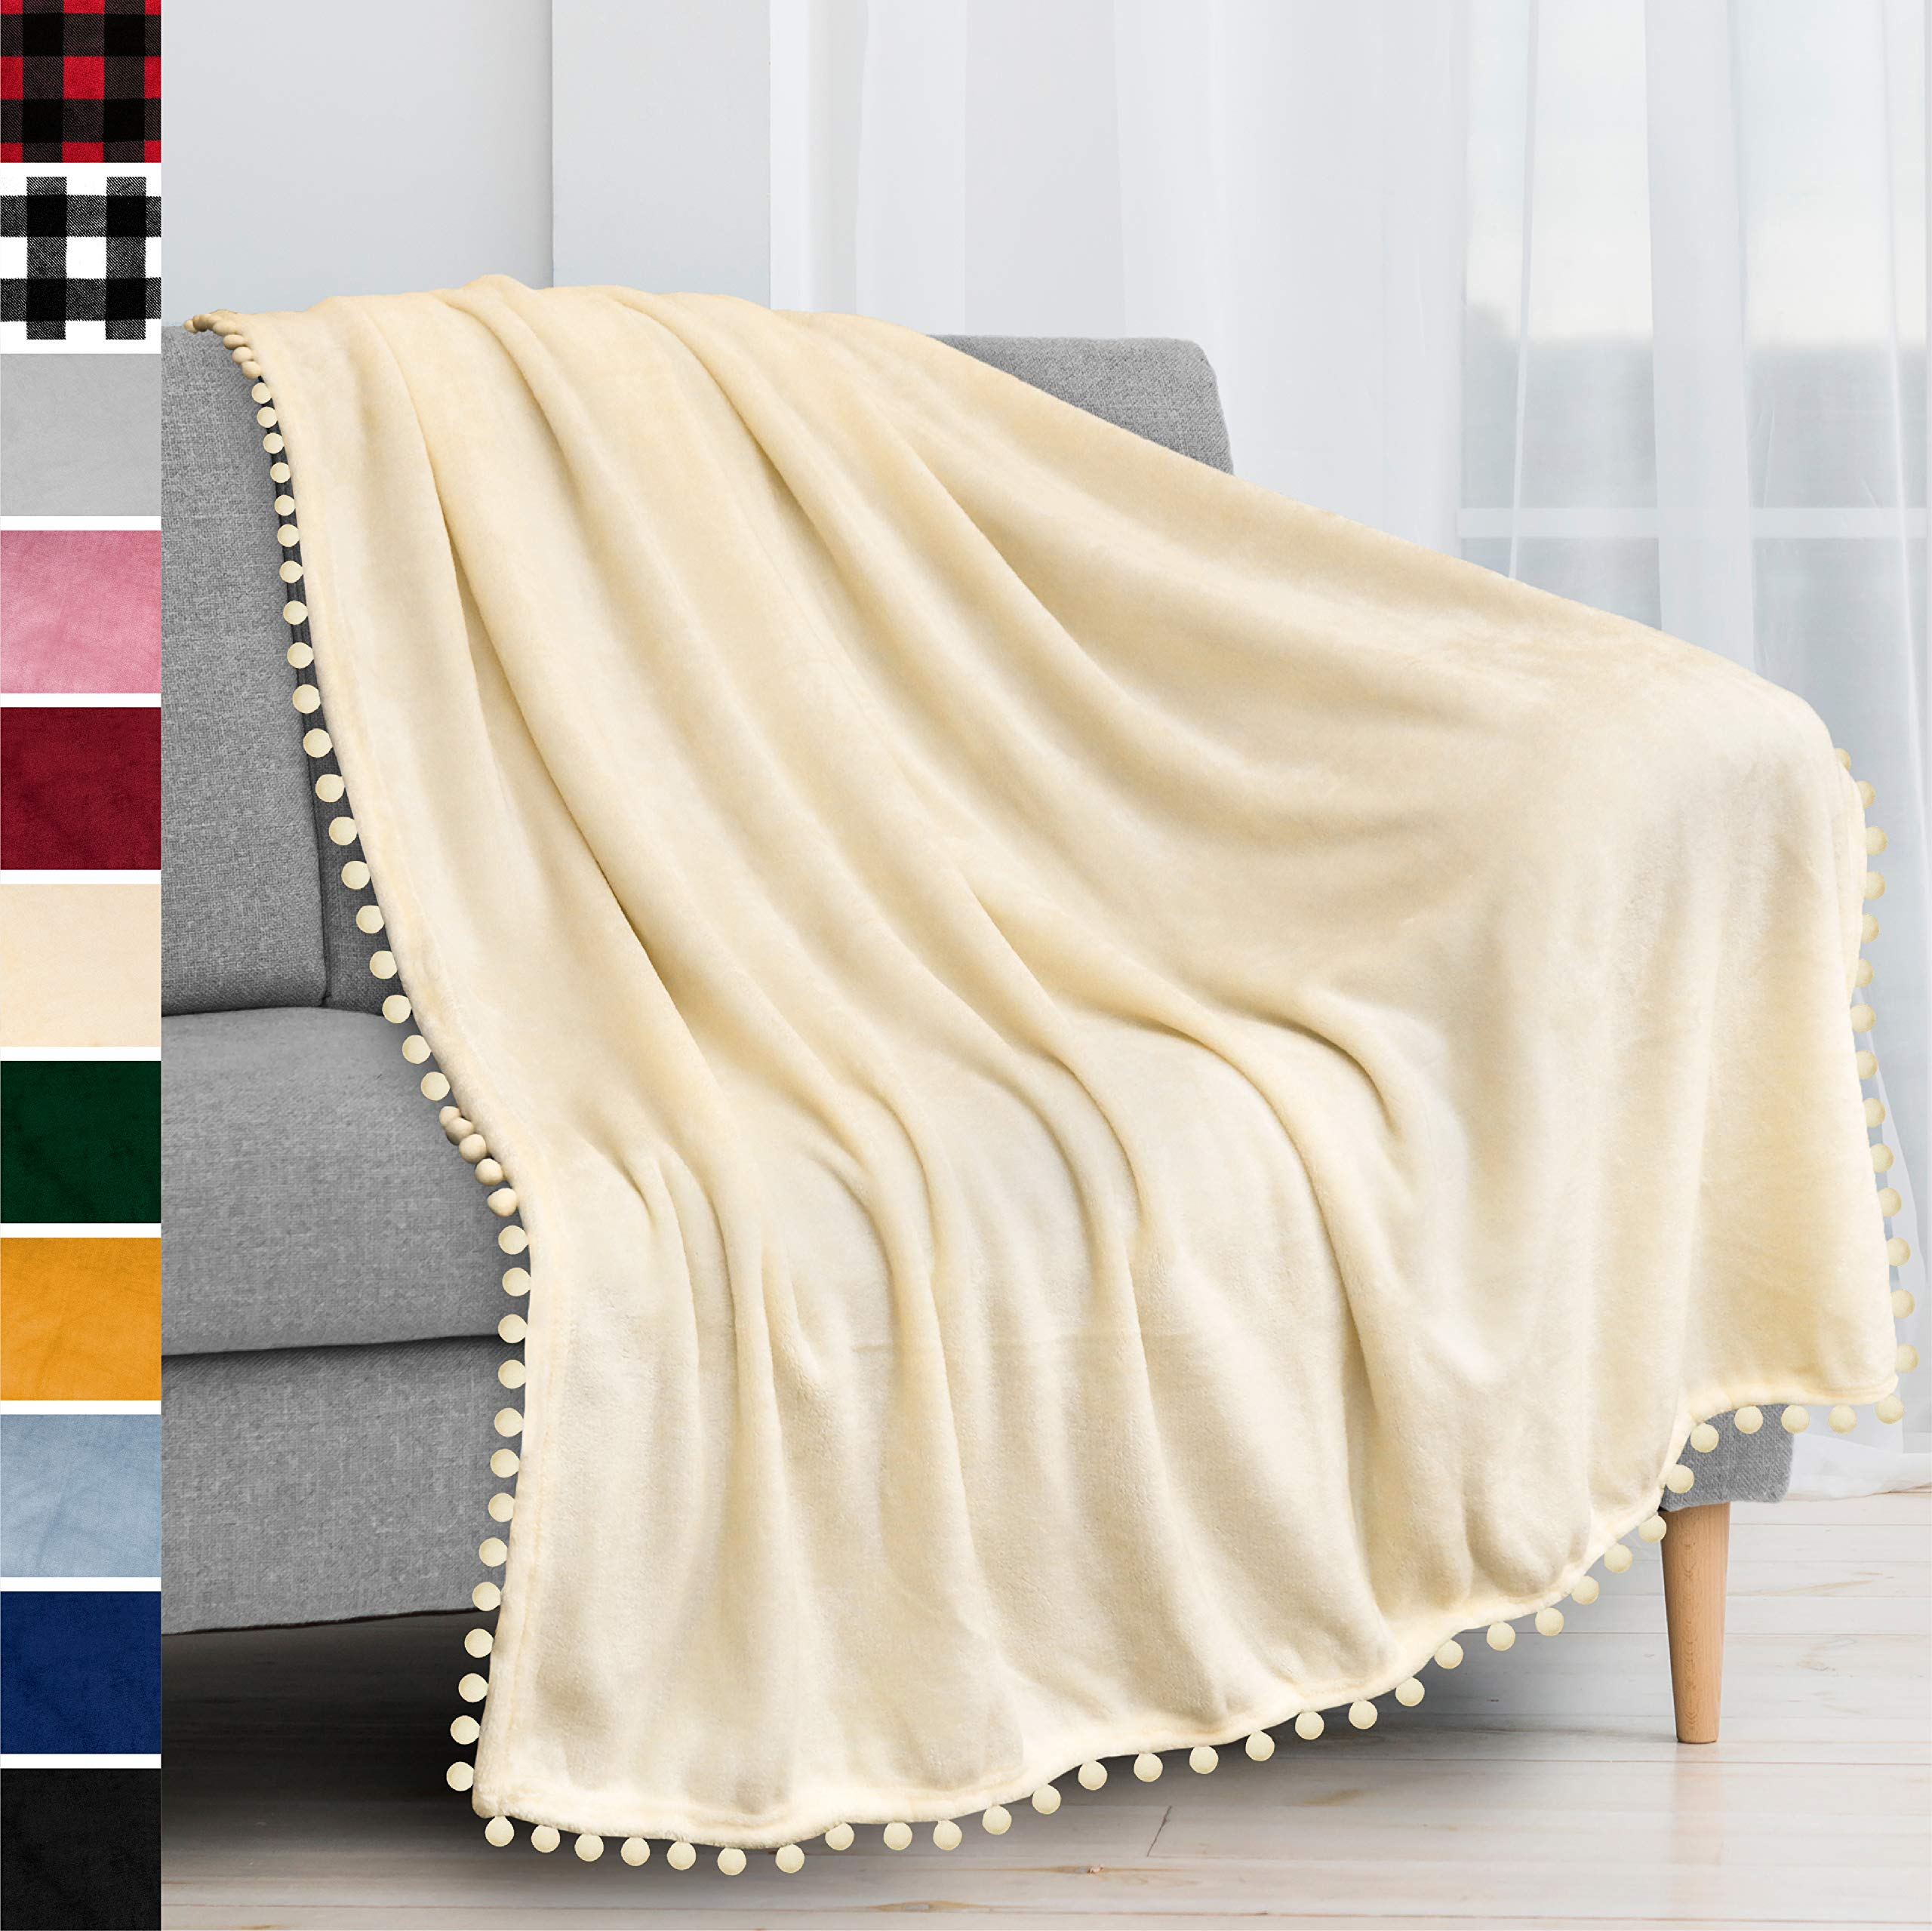 PAVILIA Fleece Throw Blanket with Pom Pom Fringe   Ivory Cream Flannel Throw   Super Soft Lightweight Microfiber Polyester   Plush, Fuzzy, Cozy, Beige White   50 x 60 Inches